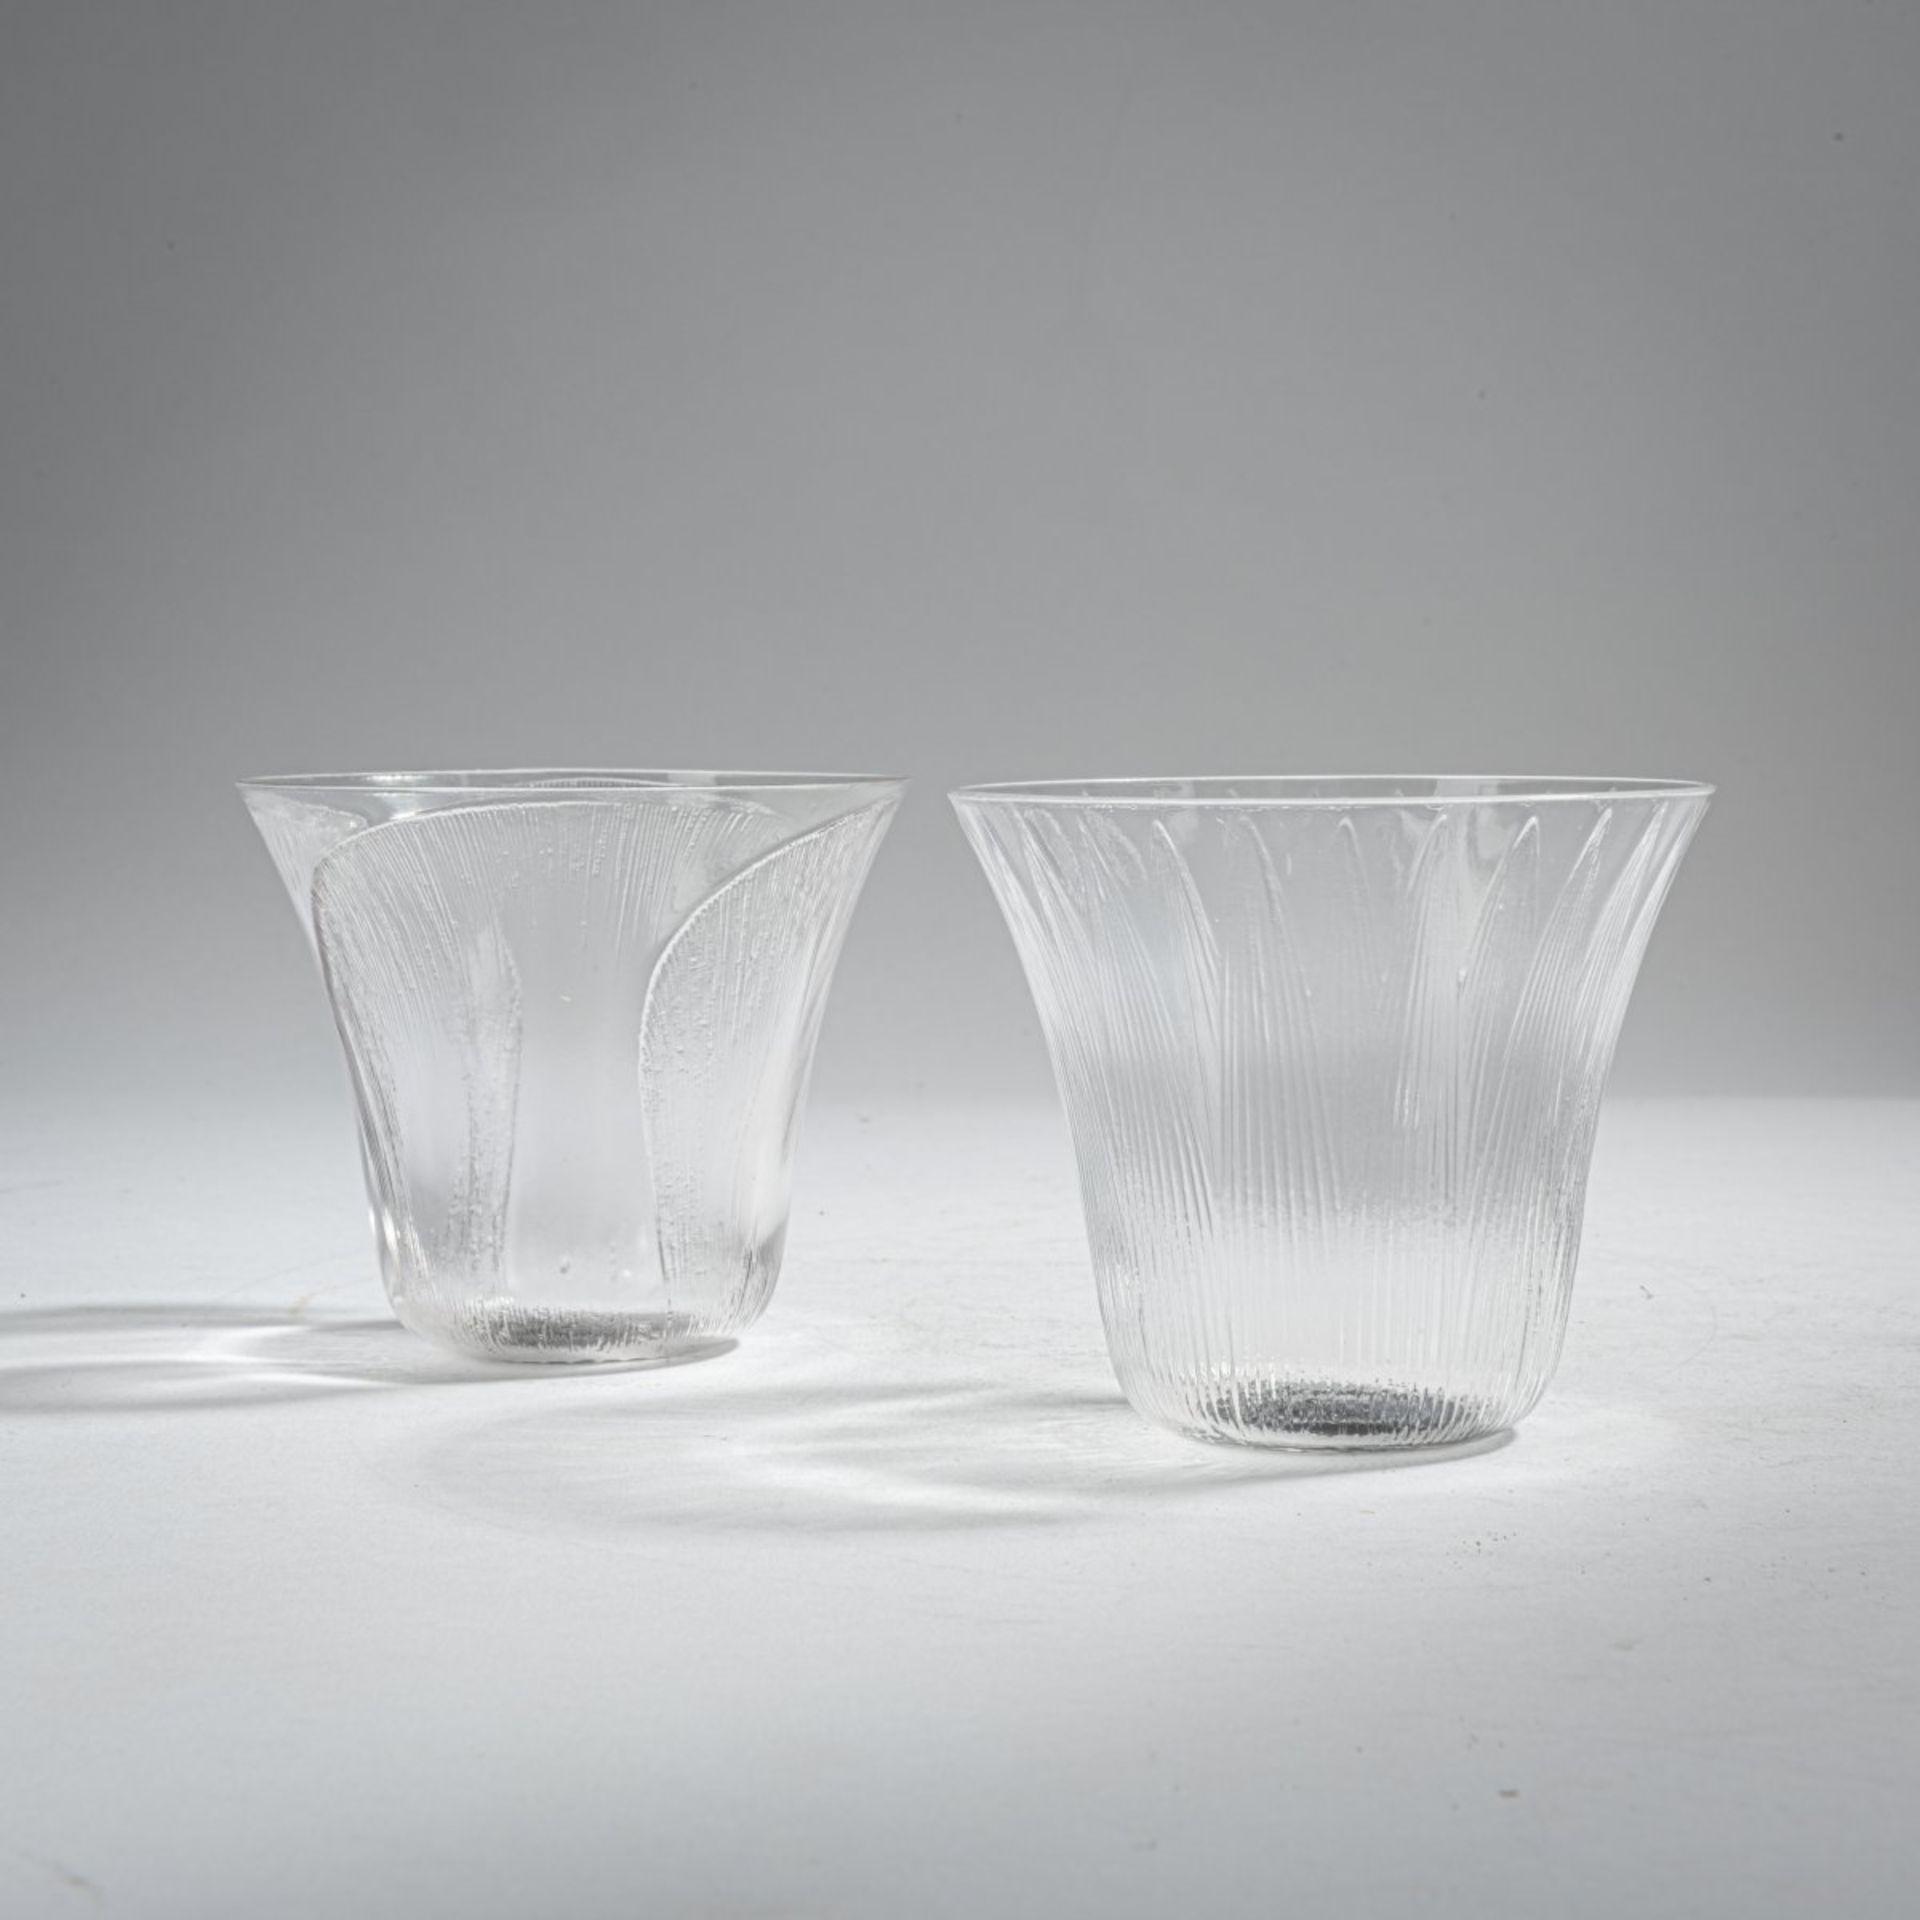 René Lalique, Zwei Trinkgläser 'Lotus' und 'Pavot', 1922